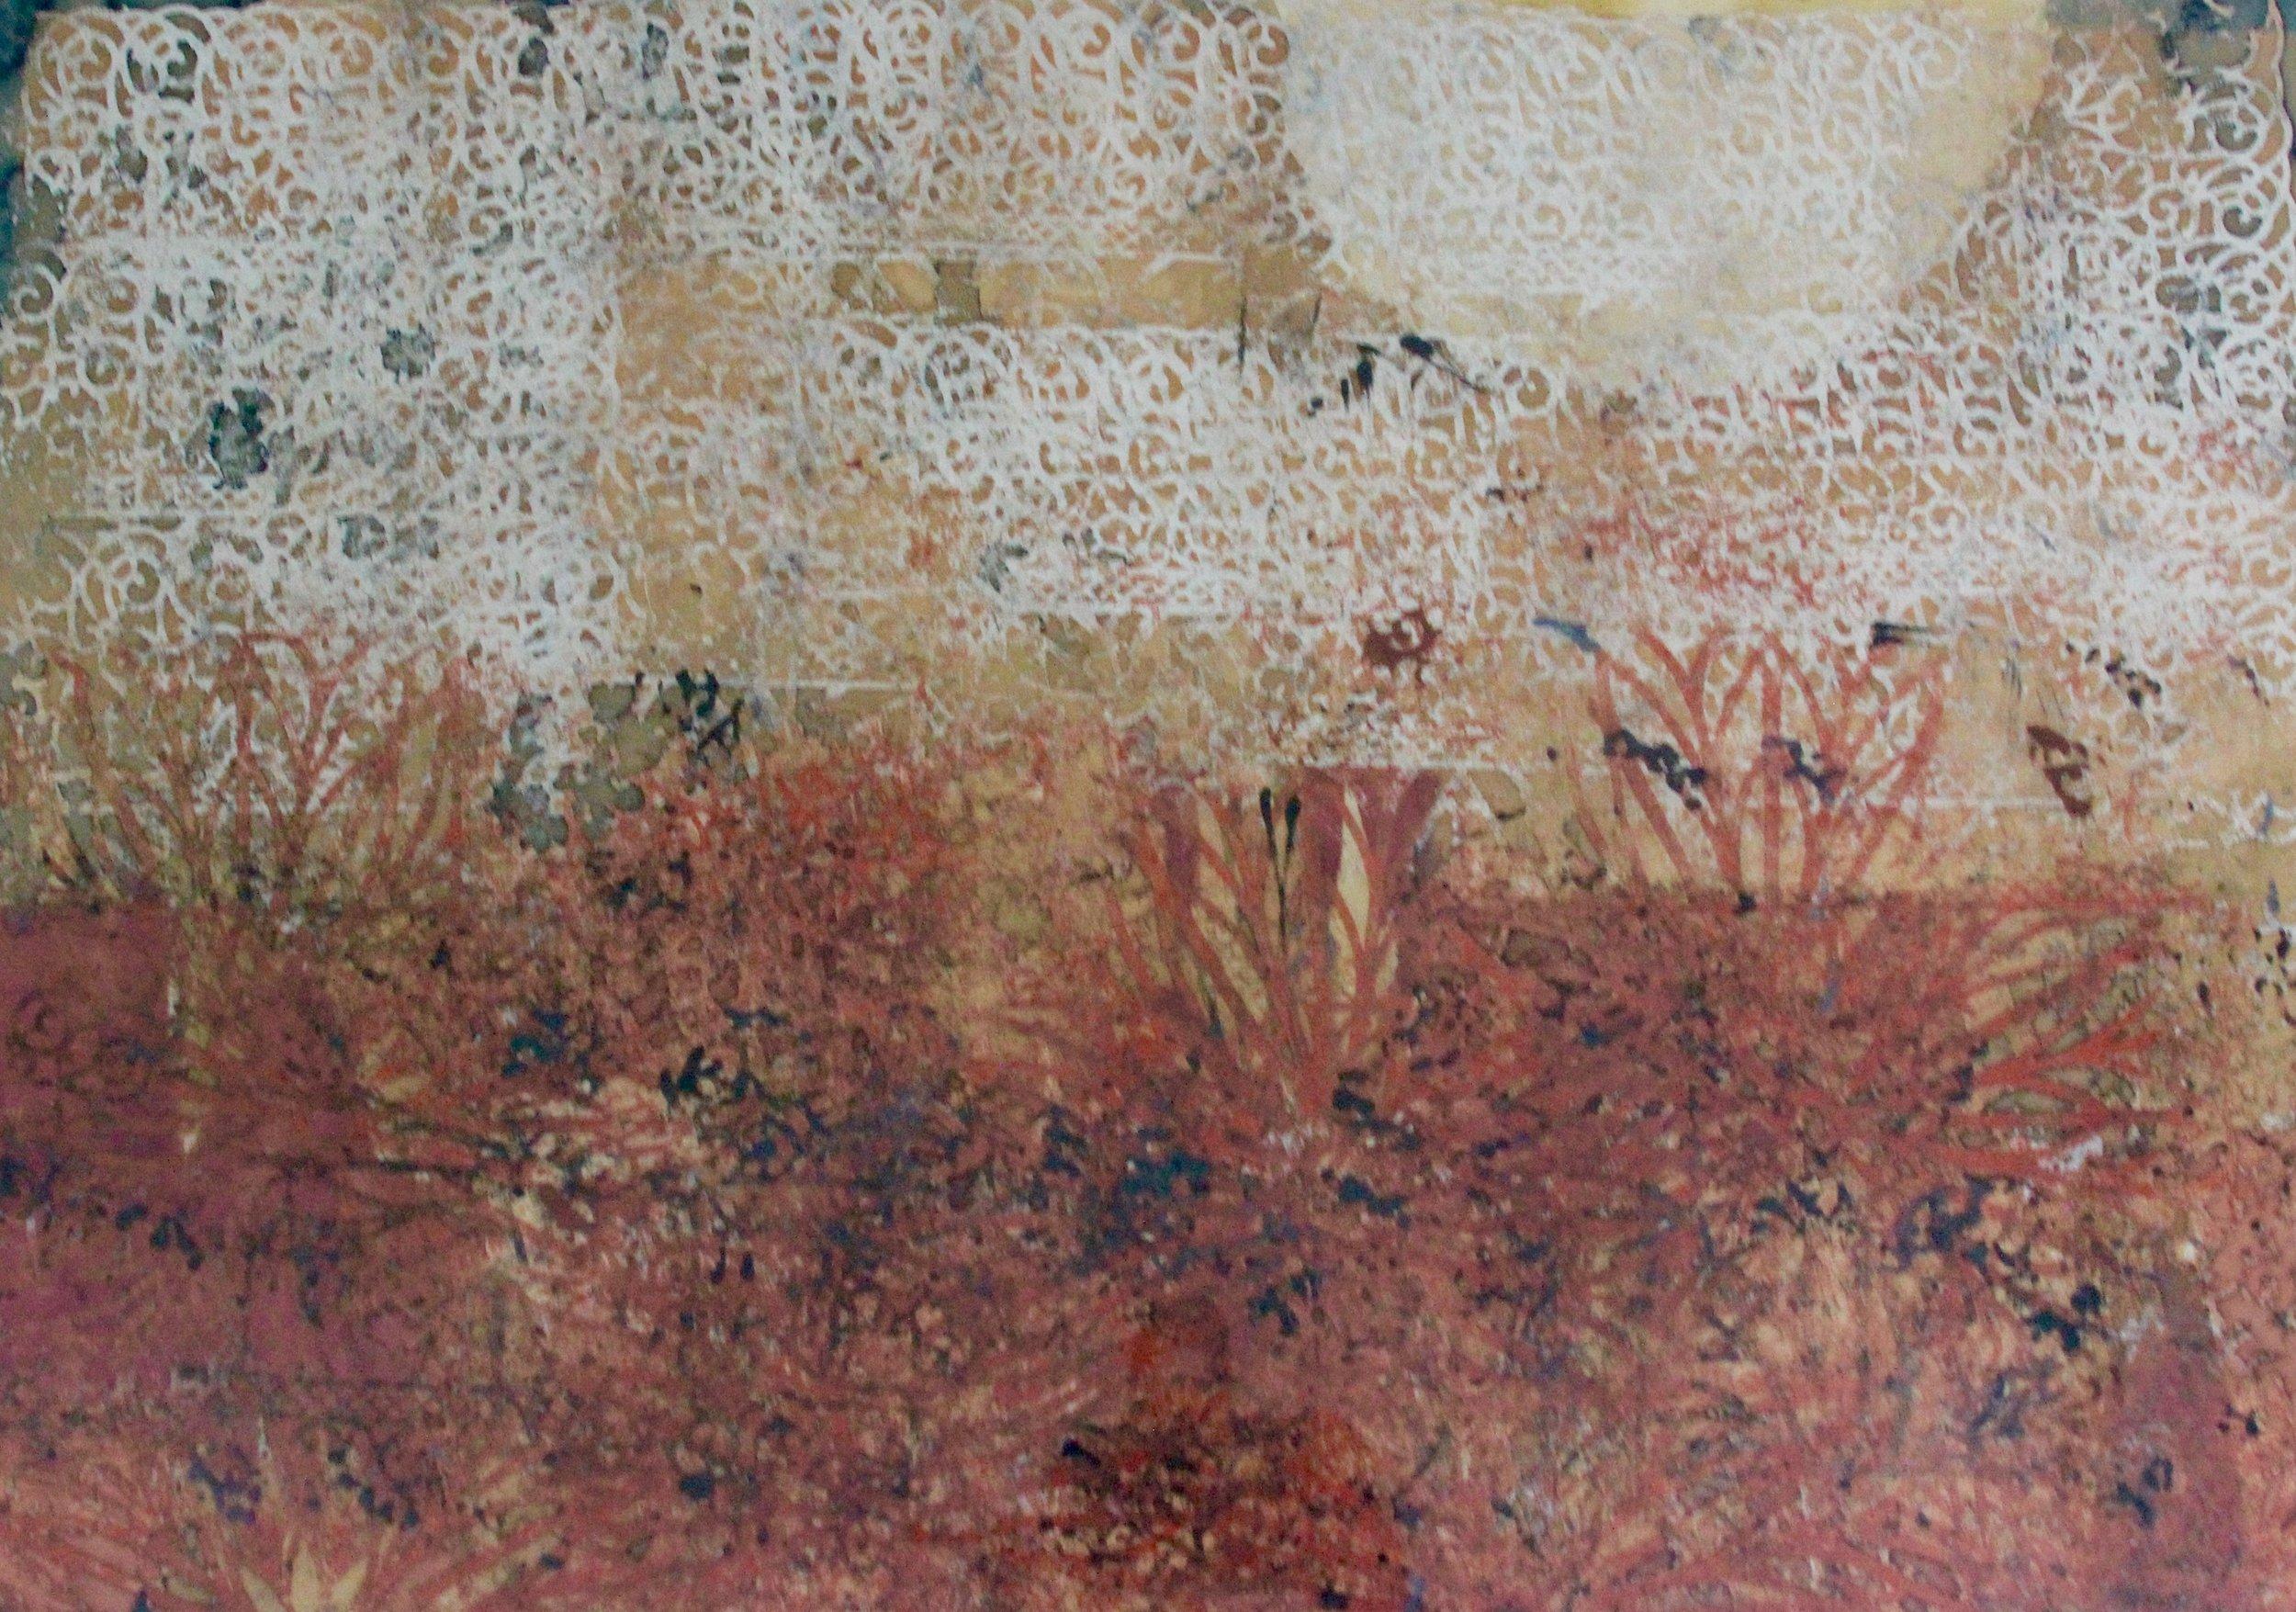 Maxwell Bates, Untitled (desert landscape), 1961